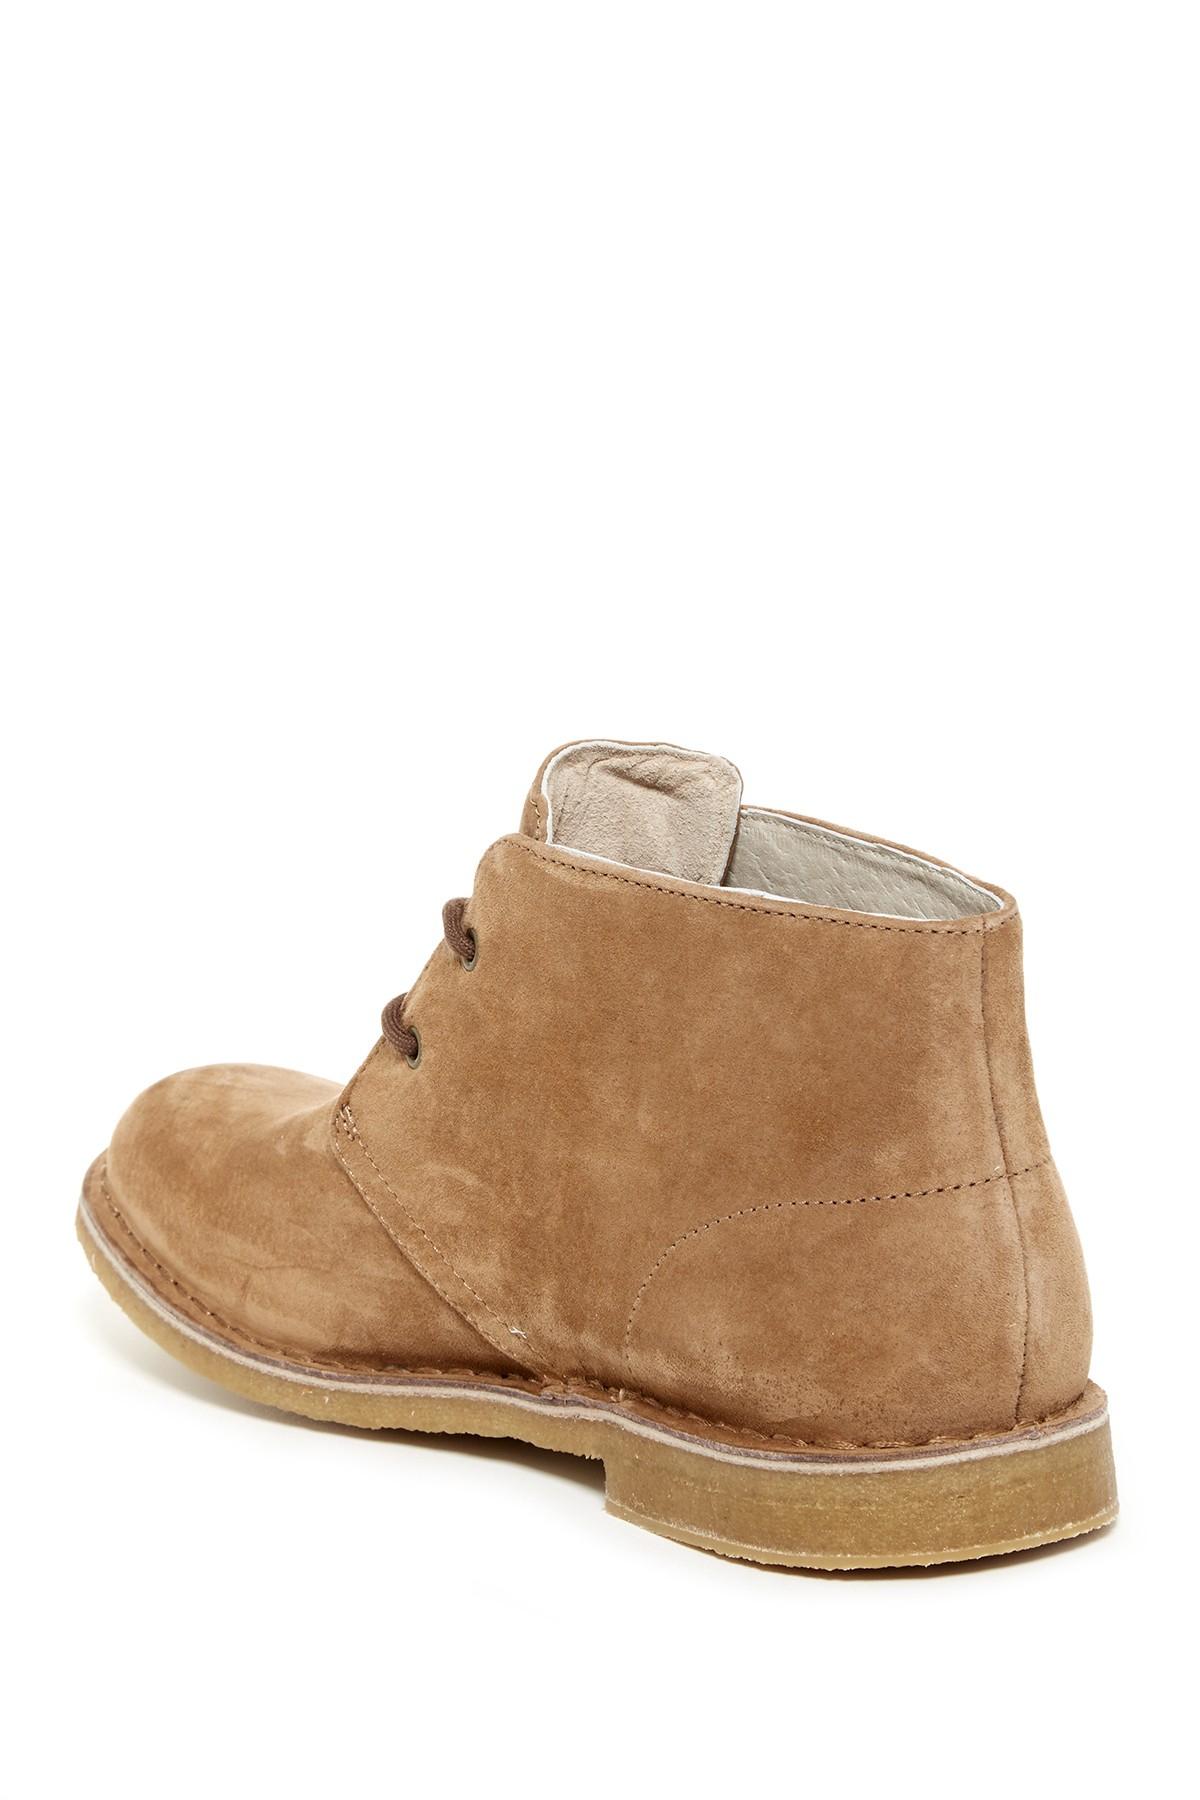 Lyst Ugg Leighton Chukka Uggpure 226 162 Wool Lined Boot